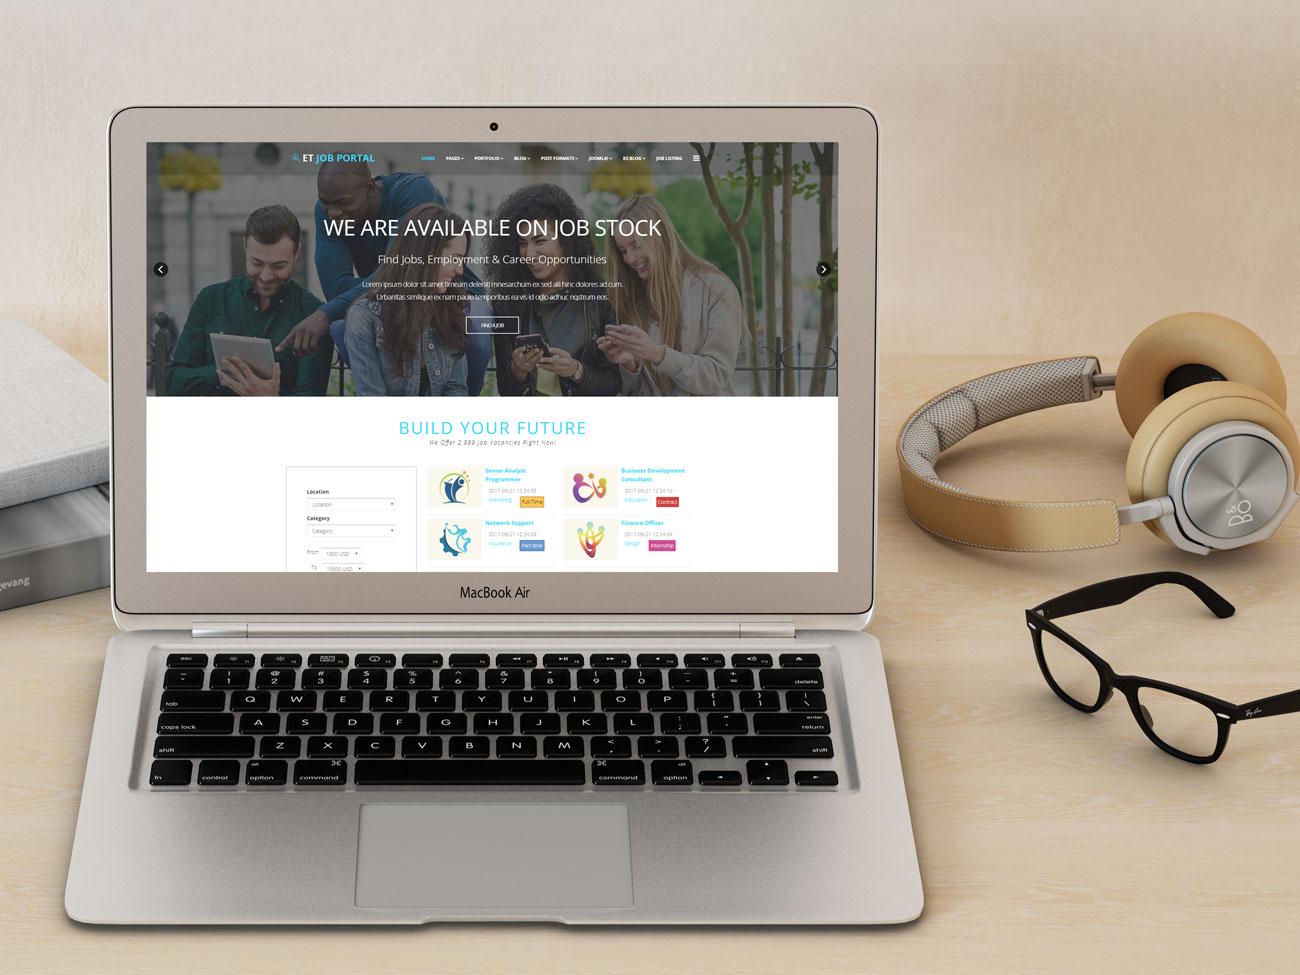 et-job-portal-free-responsive-joomla-template-screen